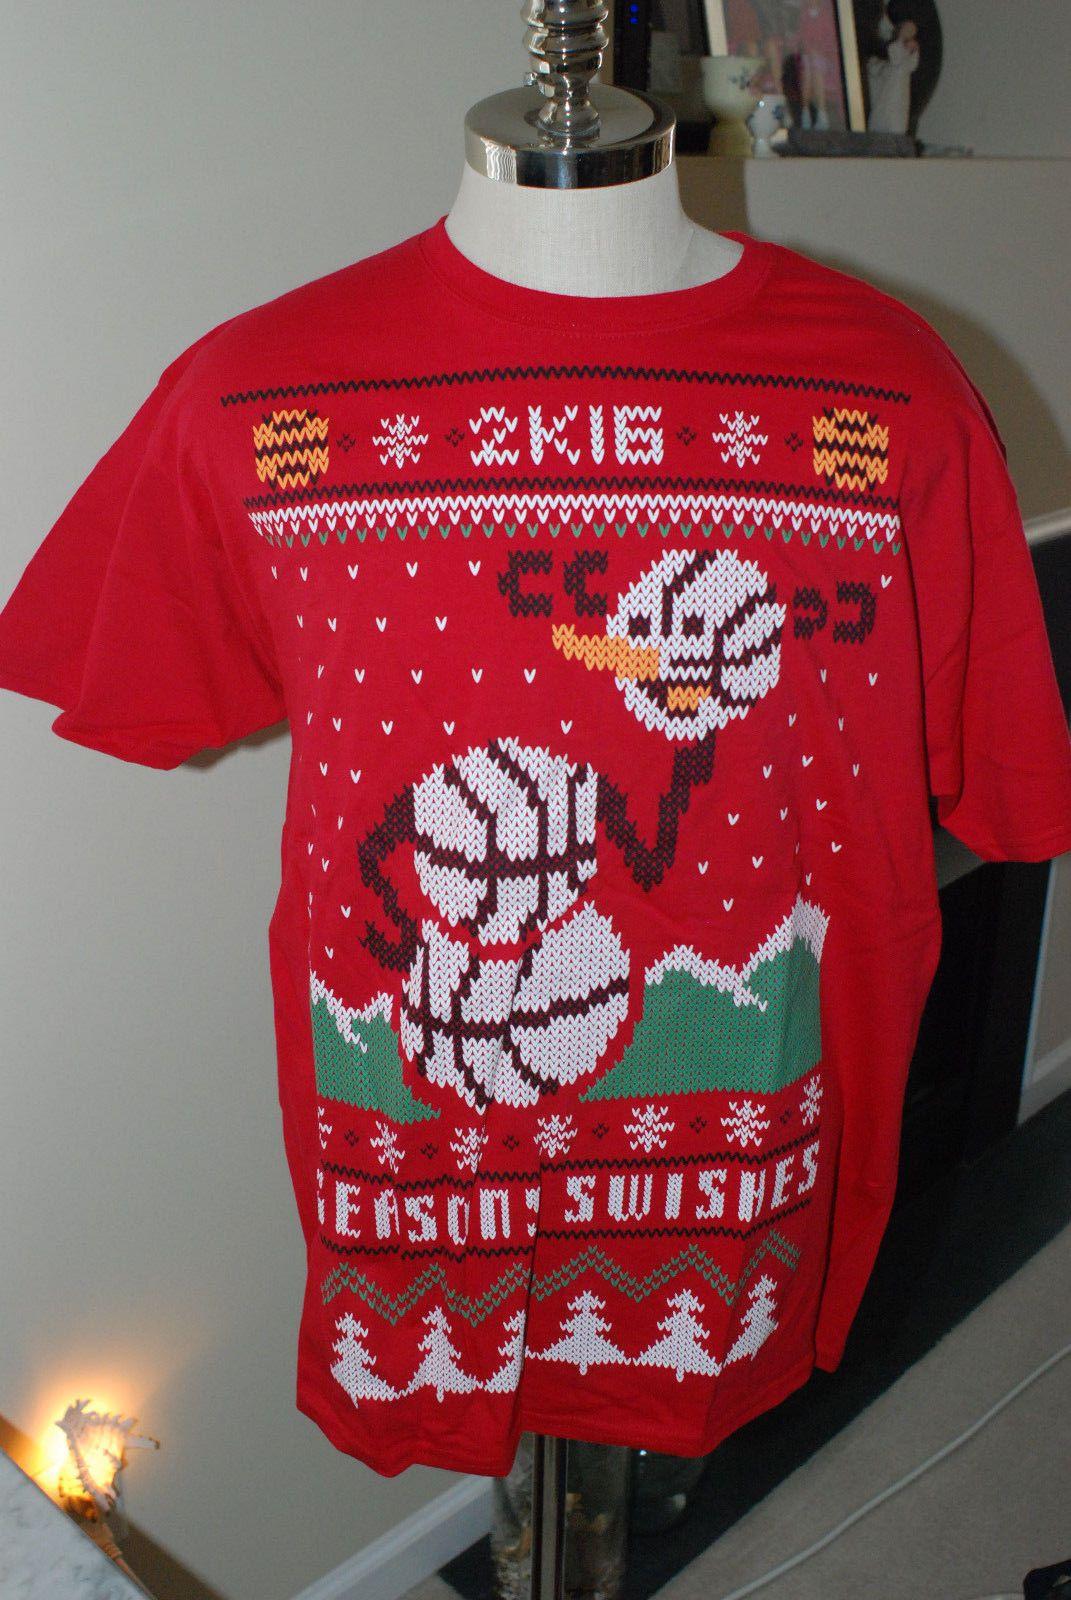 Nba 2k16 Promo Ugly Christmas Sweater Style Nba Promo Style